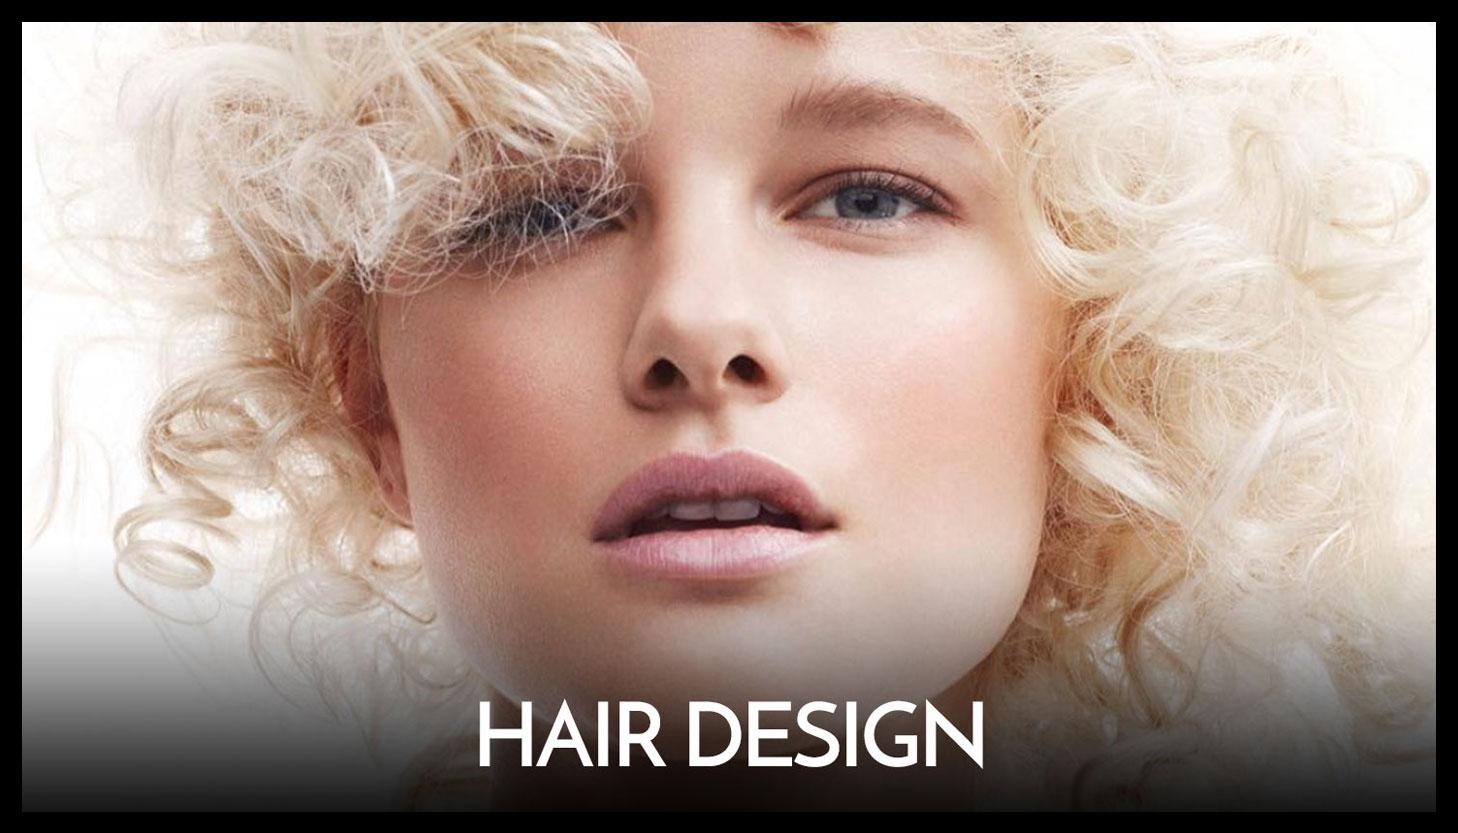 Hair-design-hover